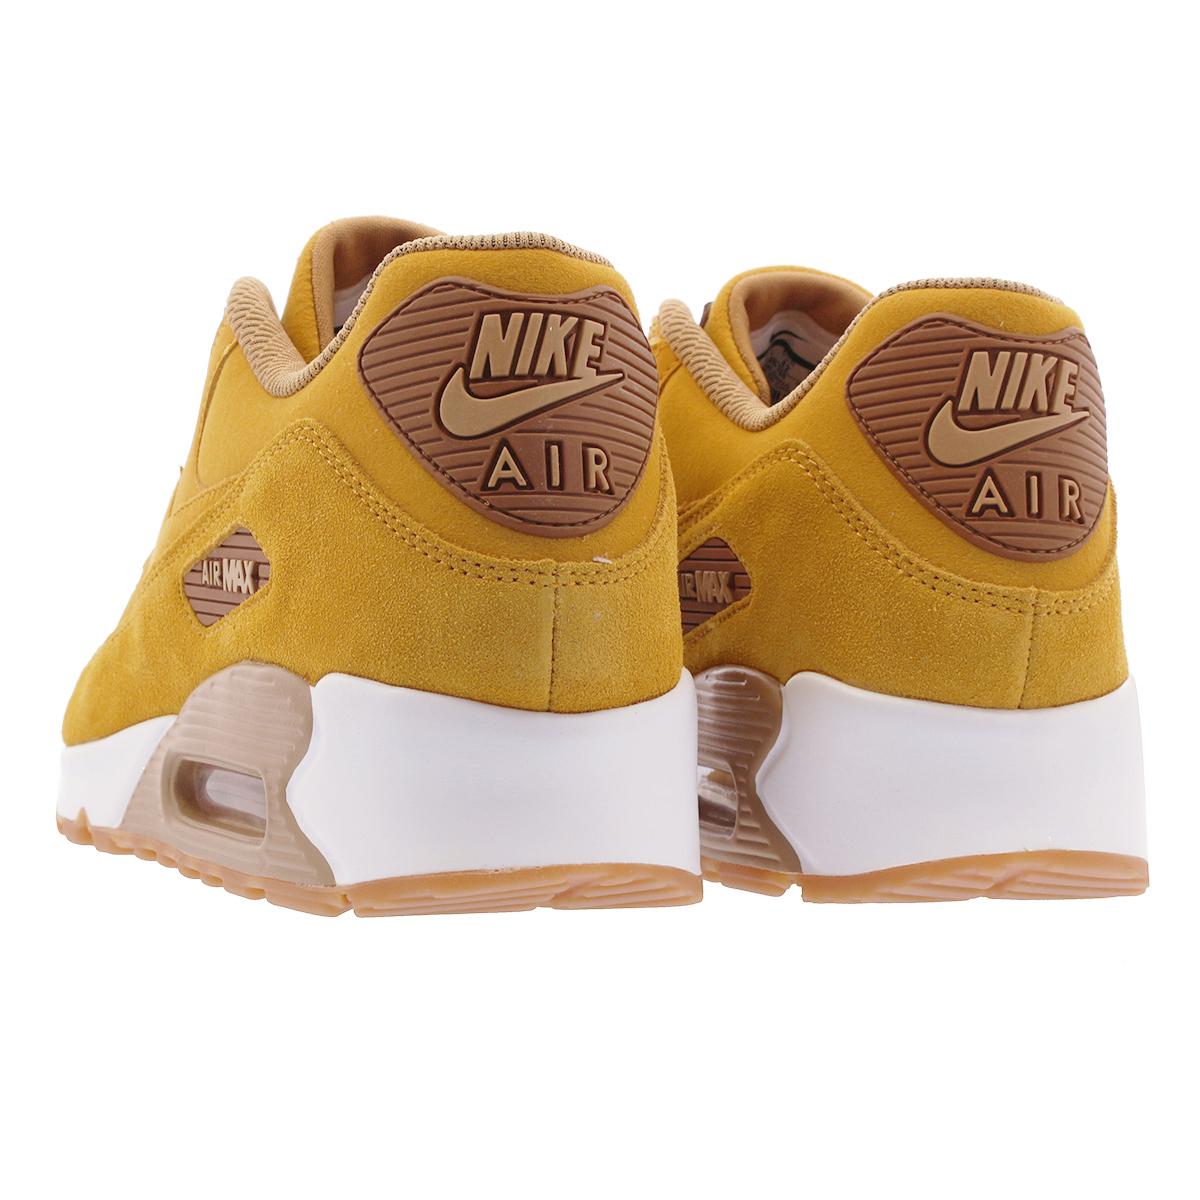 Nike Air Max 90 SE Yellow 881105 700 Women' Running Shoes